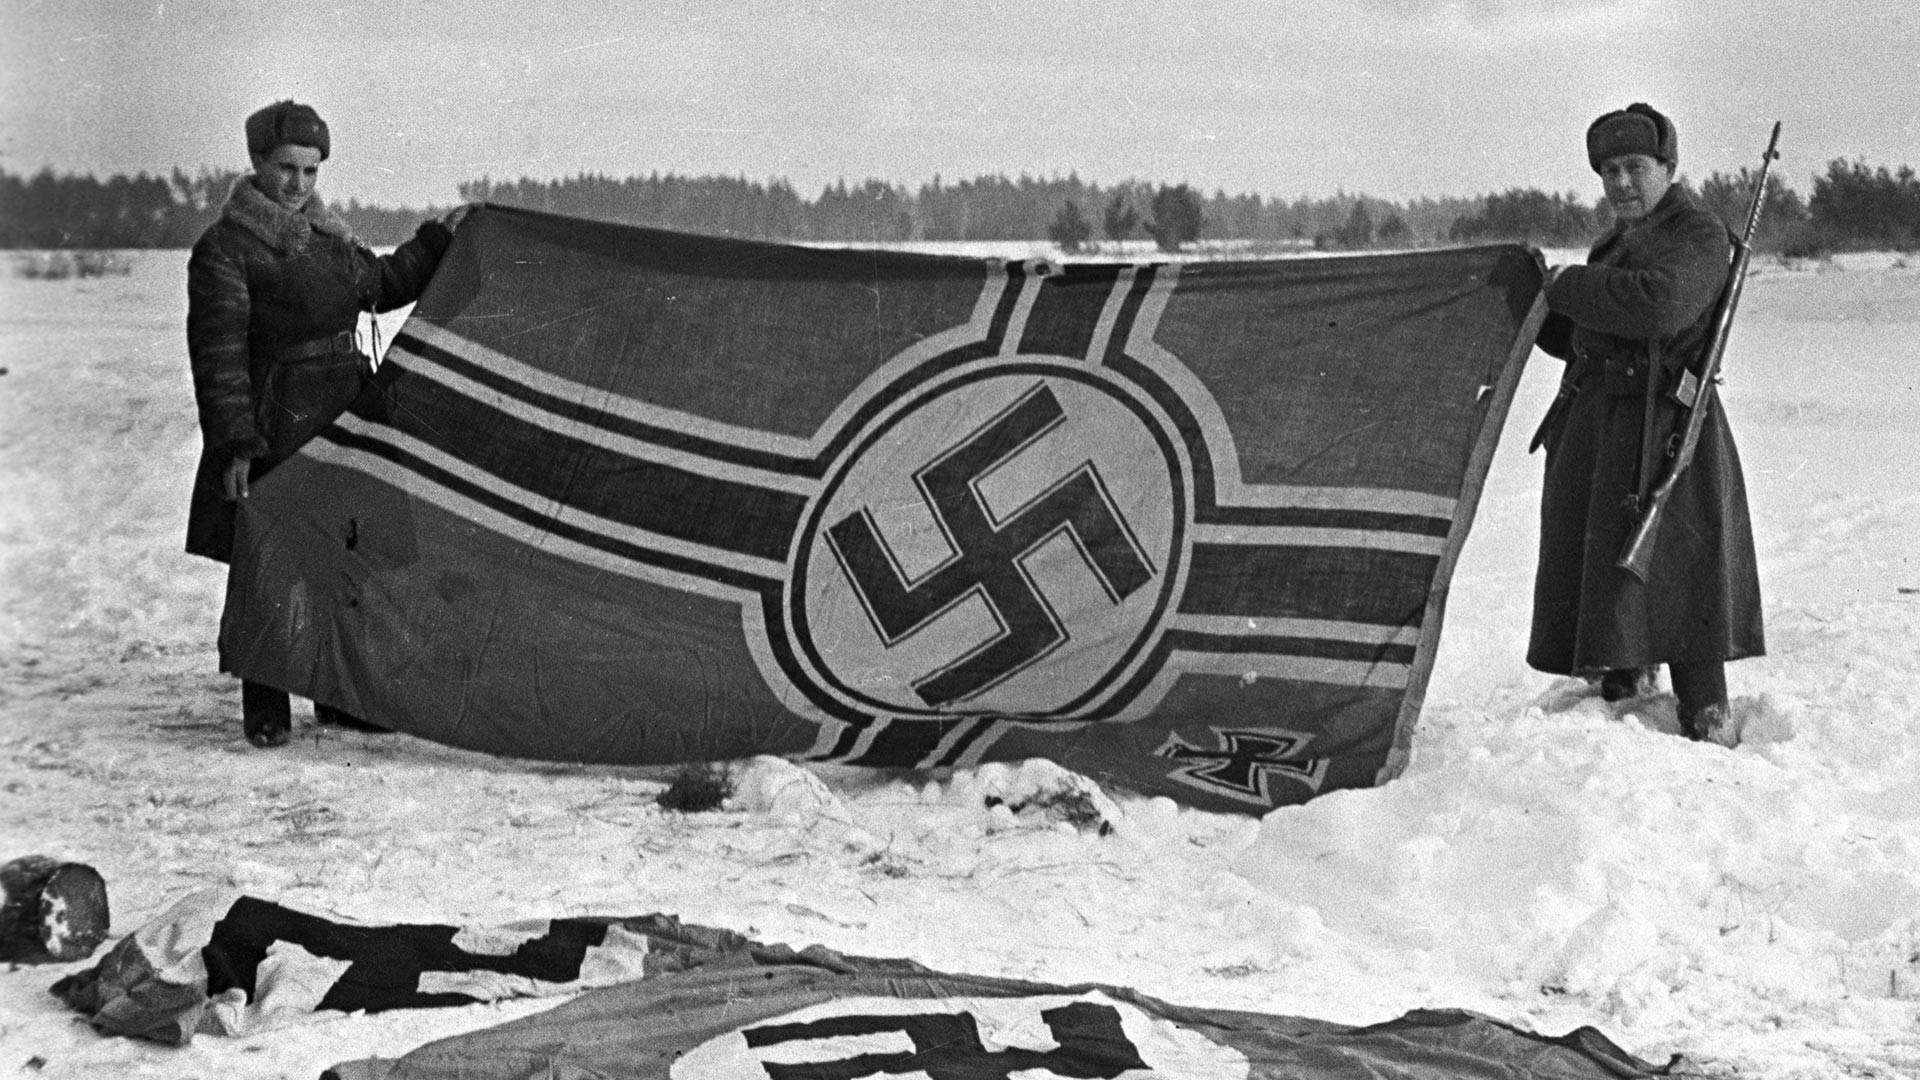 Sovjetska vojaka držita prvo zaplenjeno nemško zastavo po bitki pri Kalininu leta 1941.